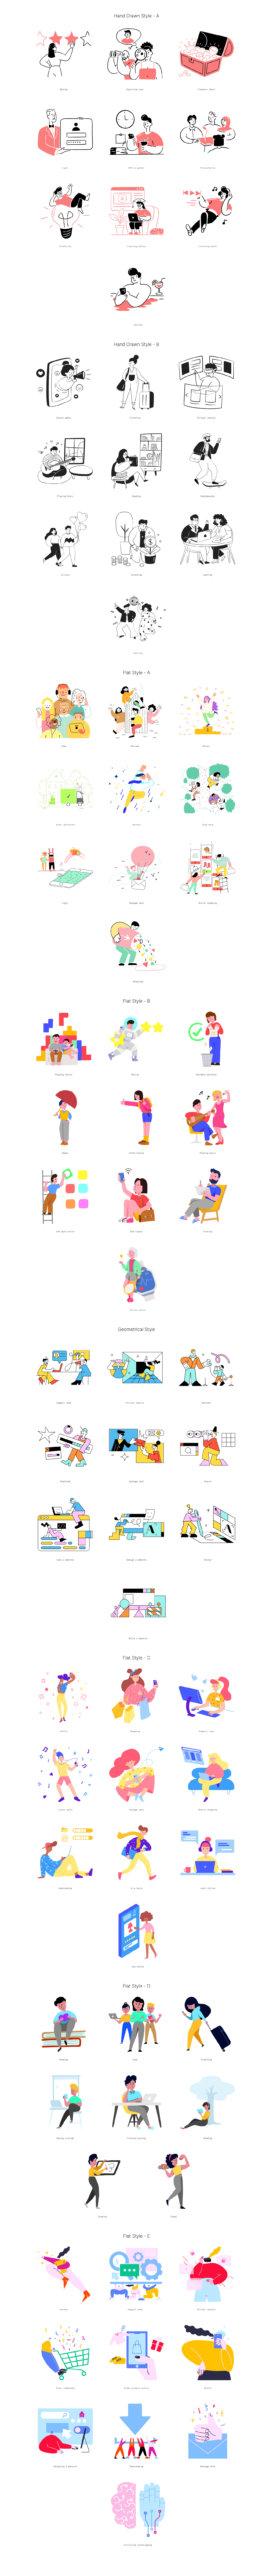 80 Streamline Free Illustrations from UIGarage